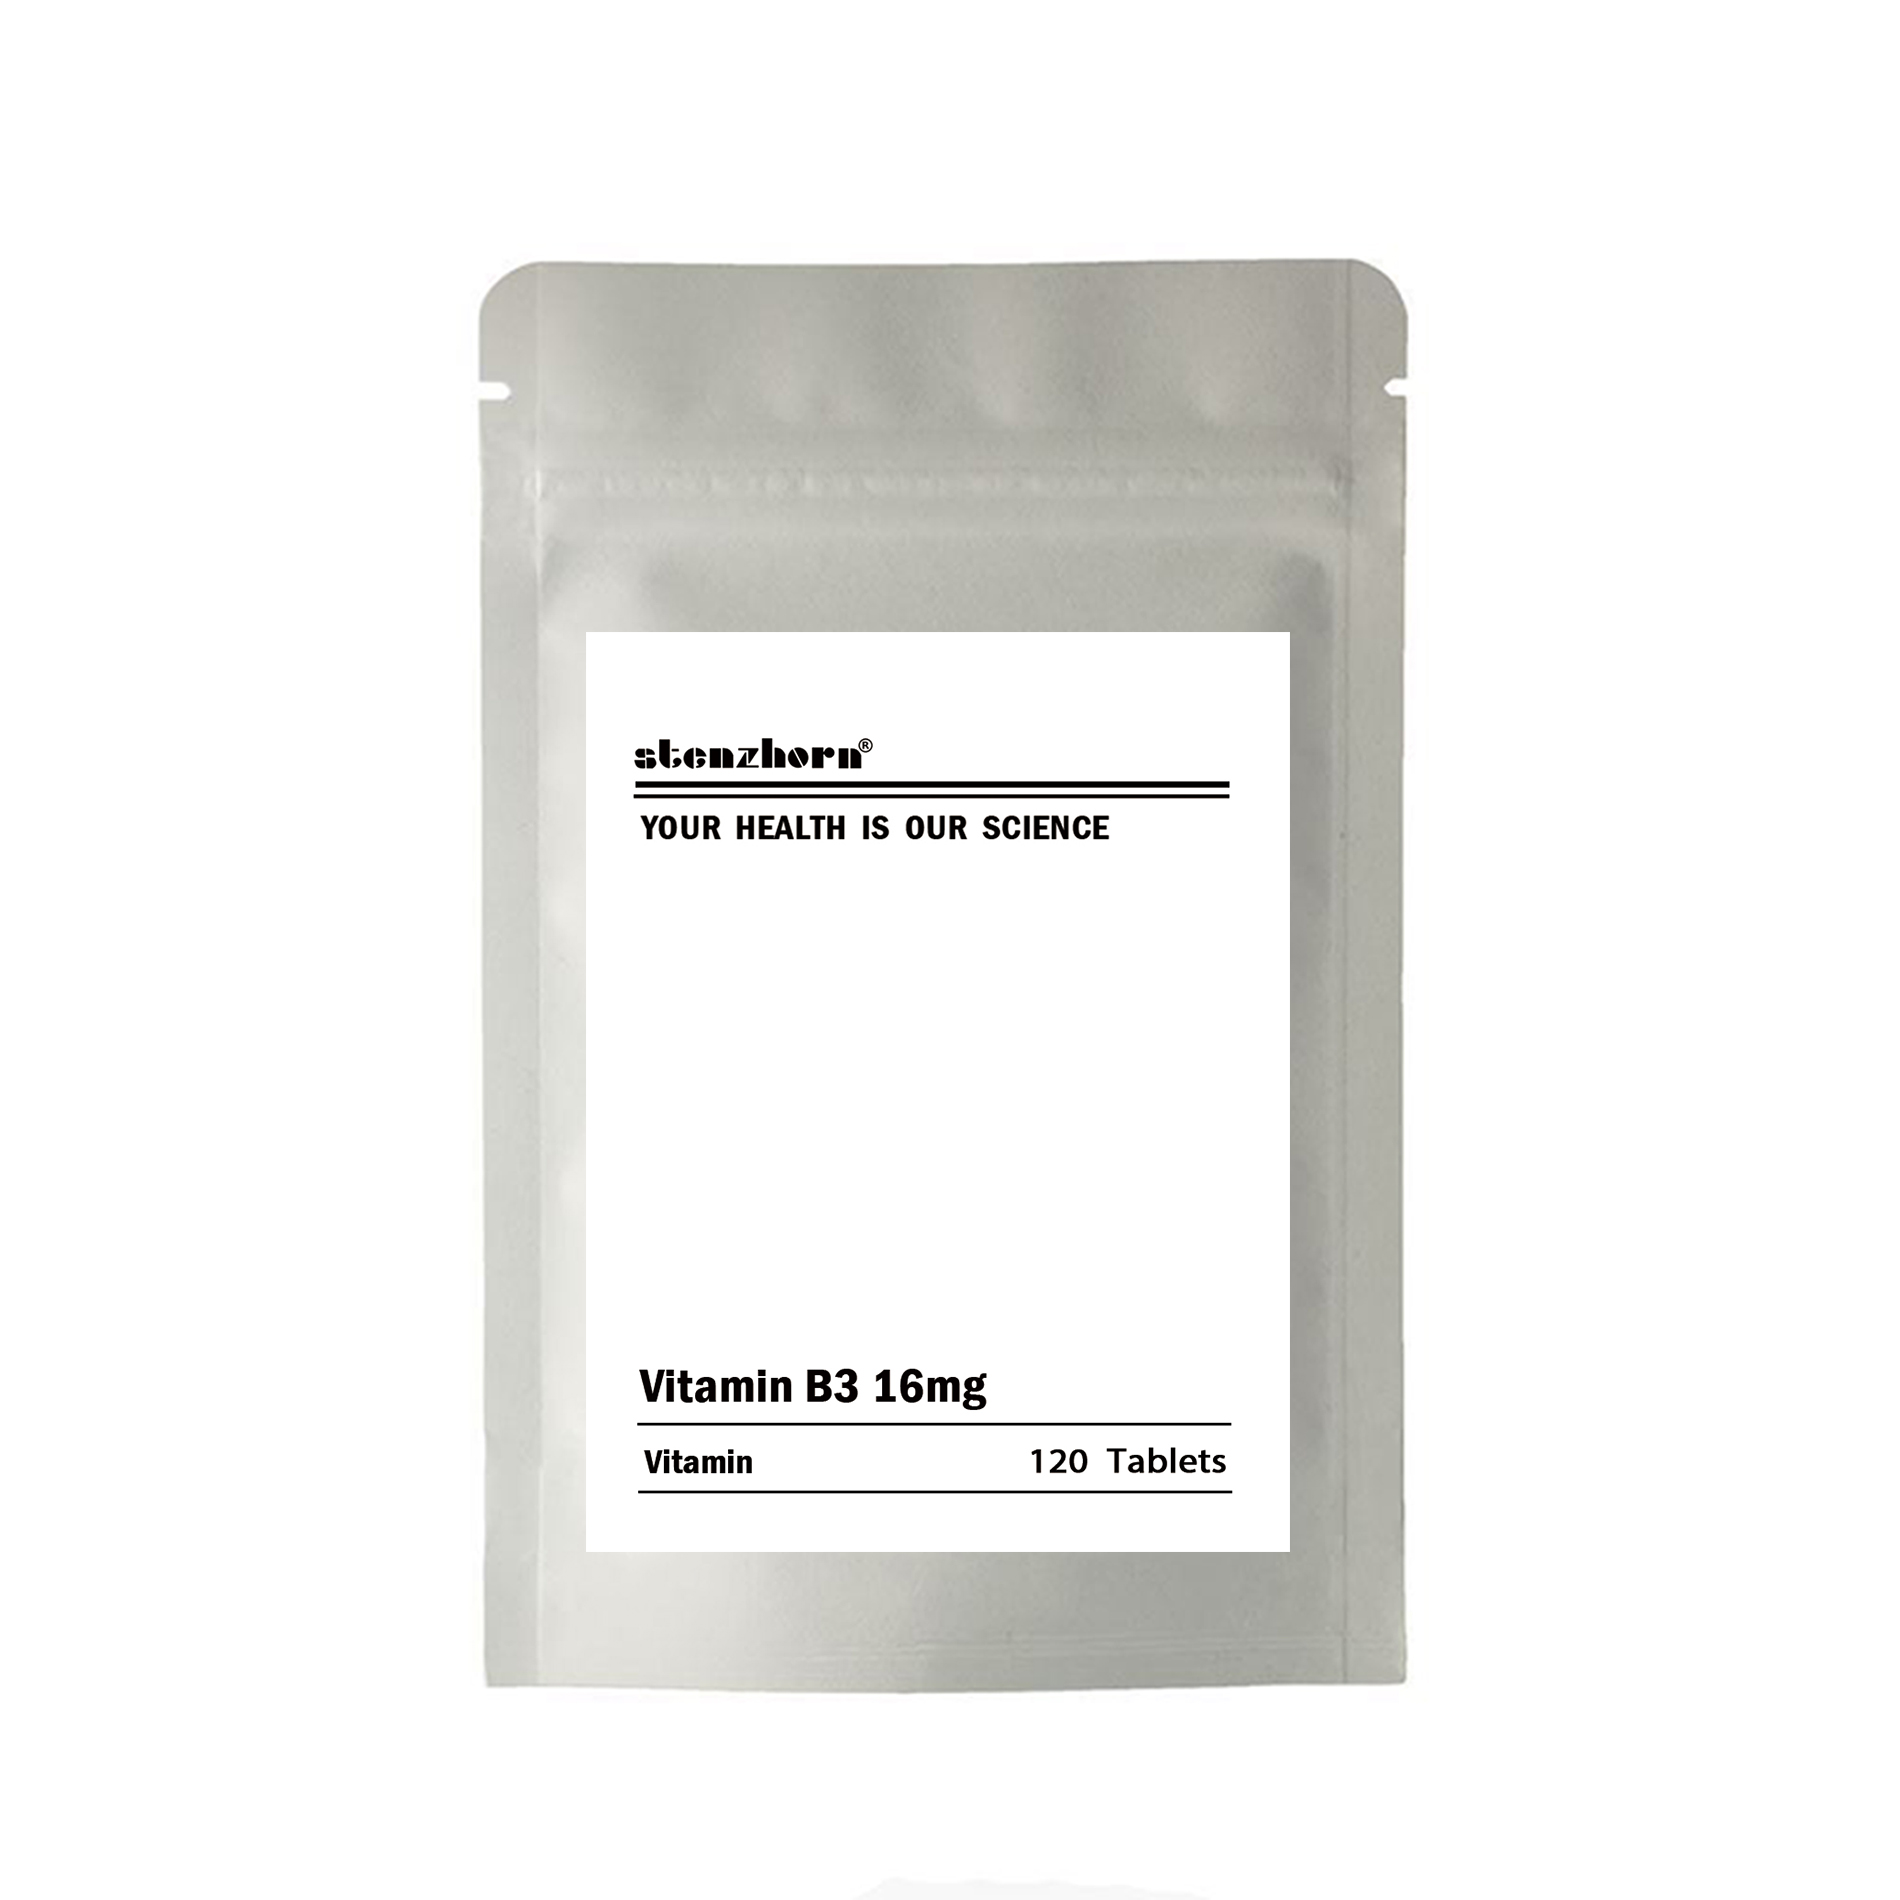 Multifunctional Supplement Vitamin B3 16mg 120 Units 16mg Quality Assurance